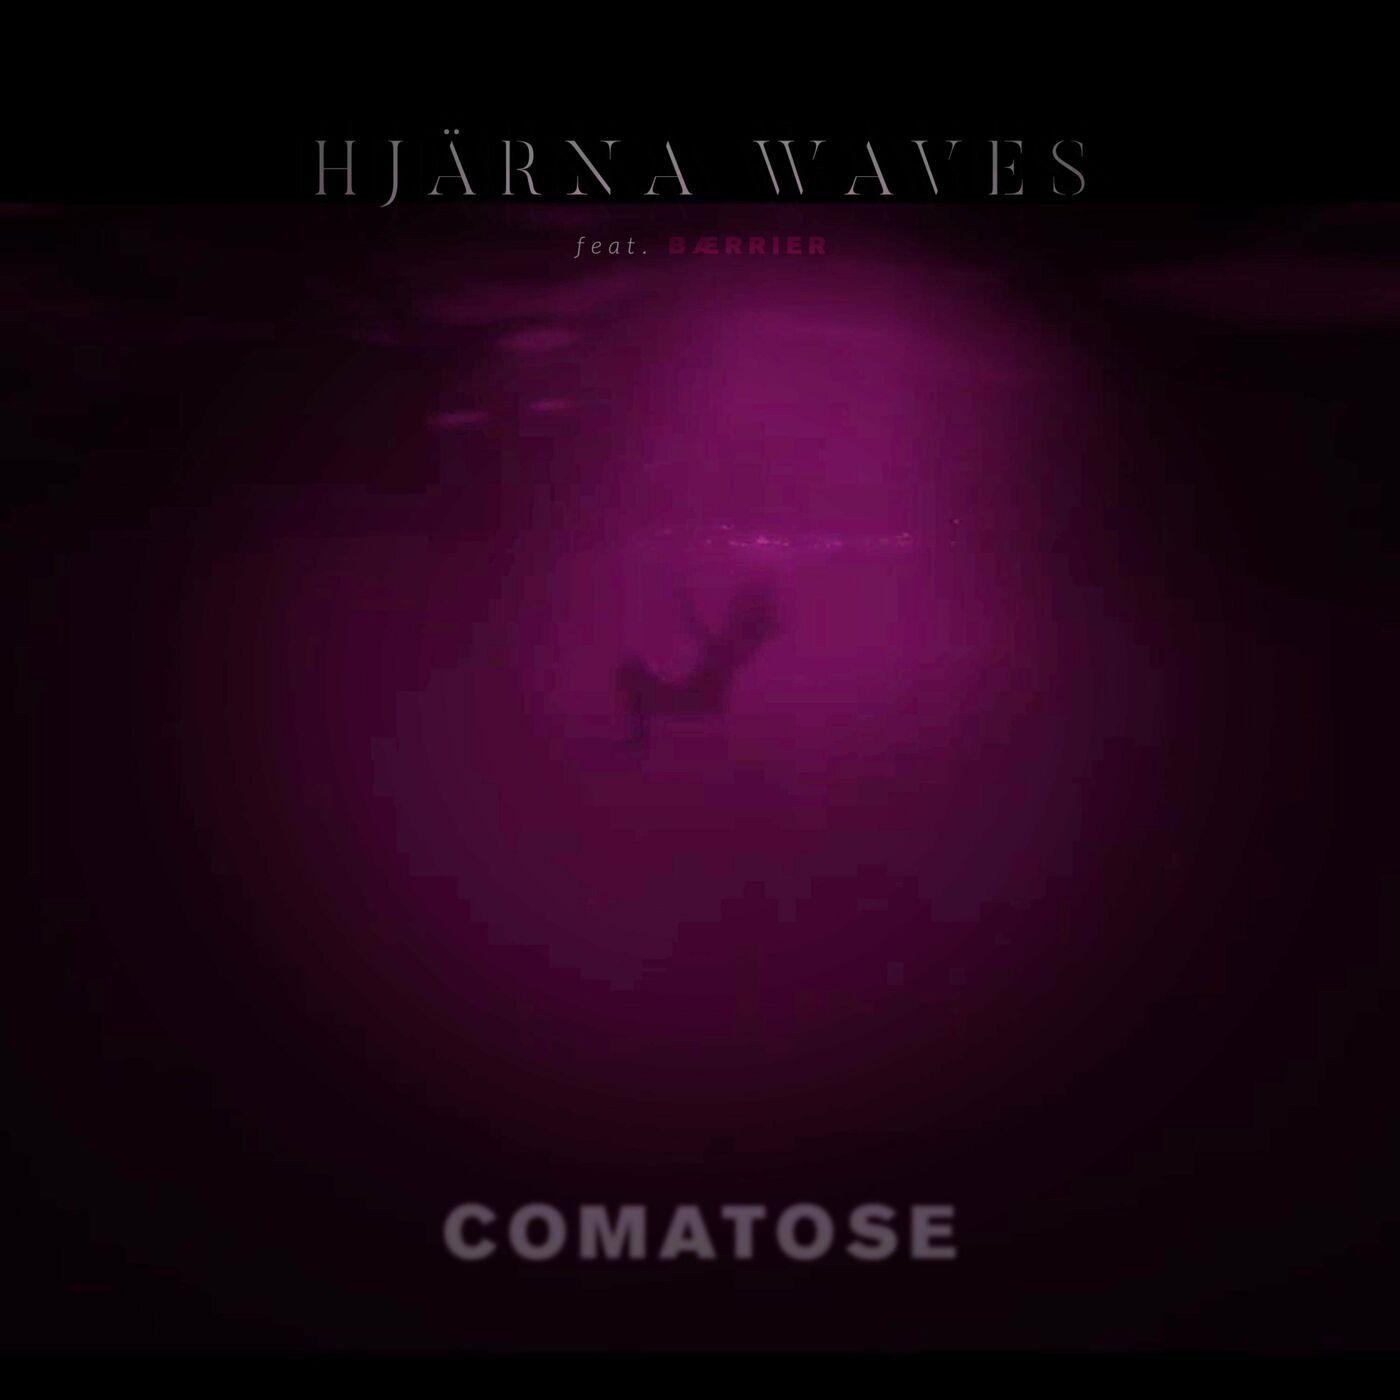 Hjärna Waves - Comatose (feat. bærrier) [single] (2020)